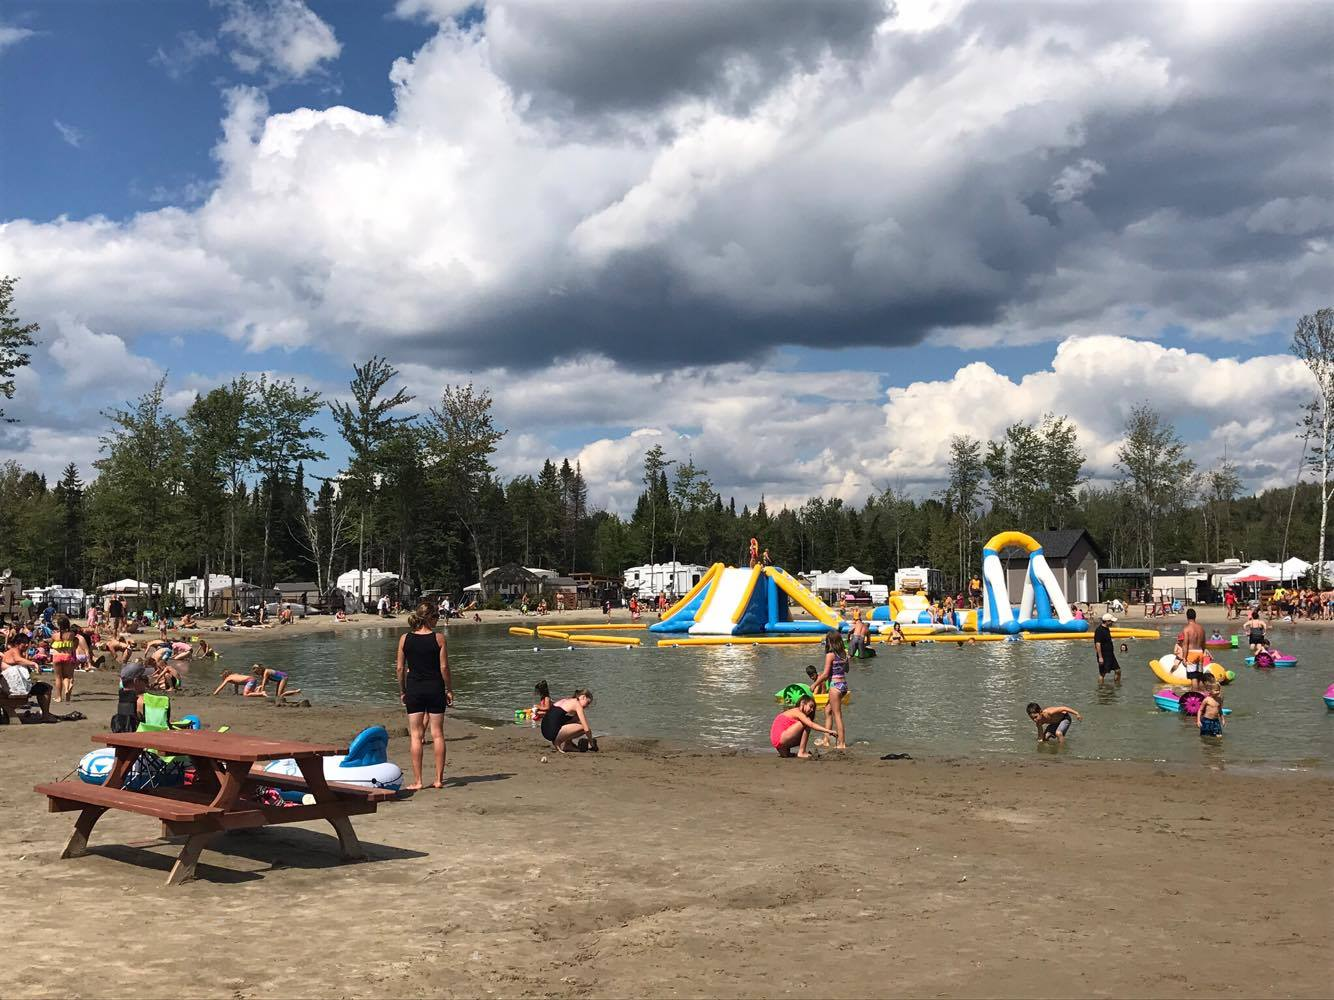 http://www.campingatlantide.com/wp-content/uploads/2018/01/beach-party-2017-complexe-atlantide-7.jpg